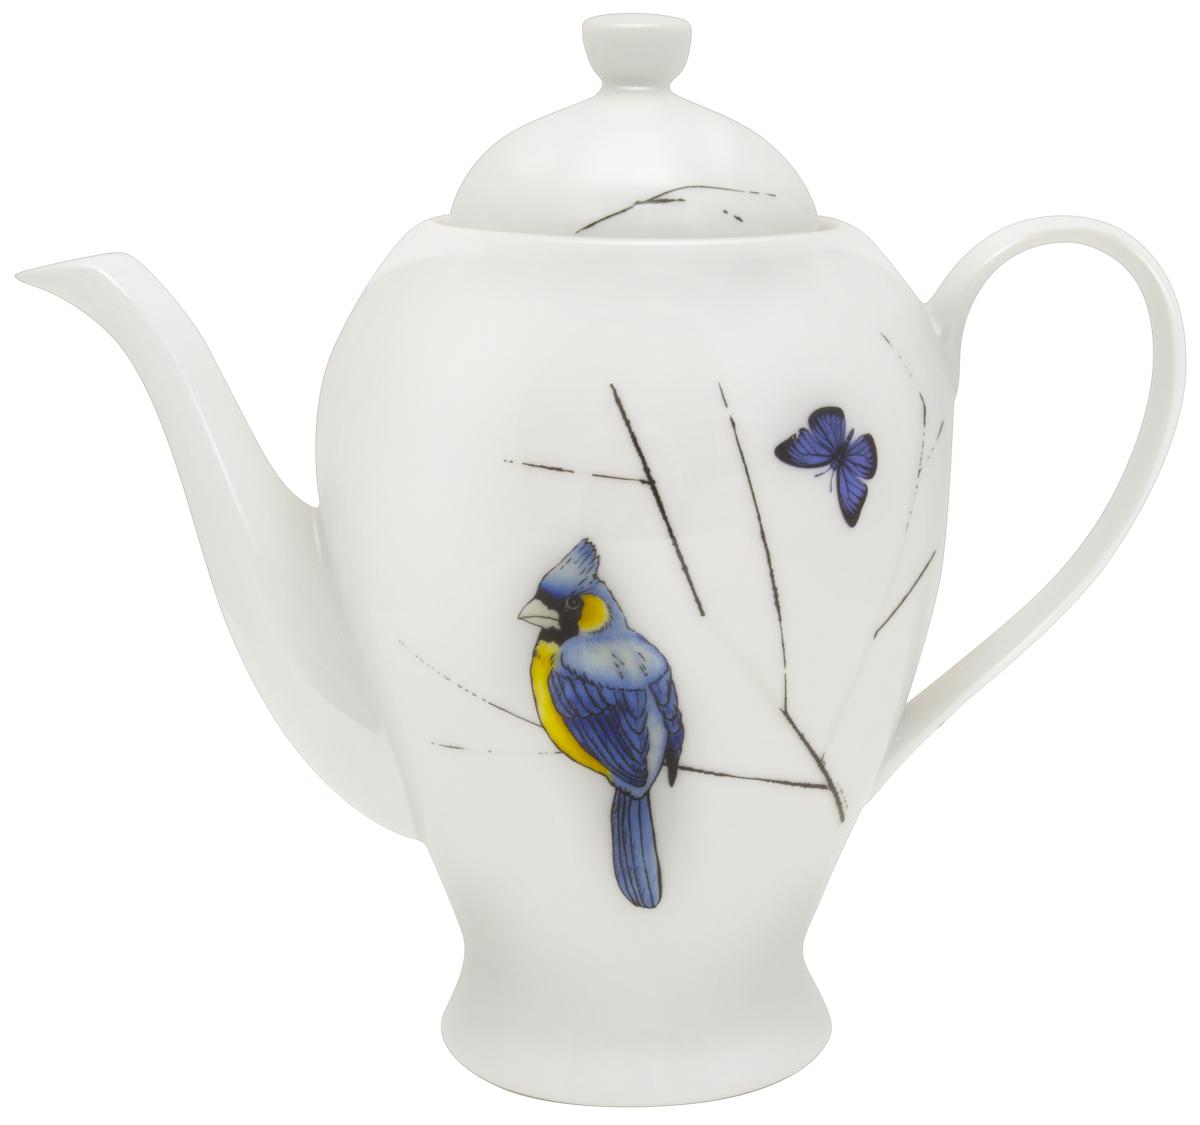 Заварочный чайник Esprado Primavera, 1290 мл. PRML12YE306PRML12YE306Заварочный чайник, 1290 мл, твердый фарфор, Primavera, Esprado, PRML12YE306